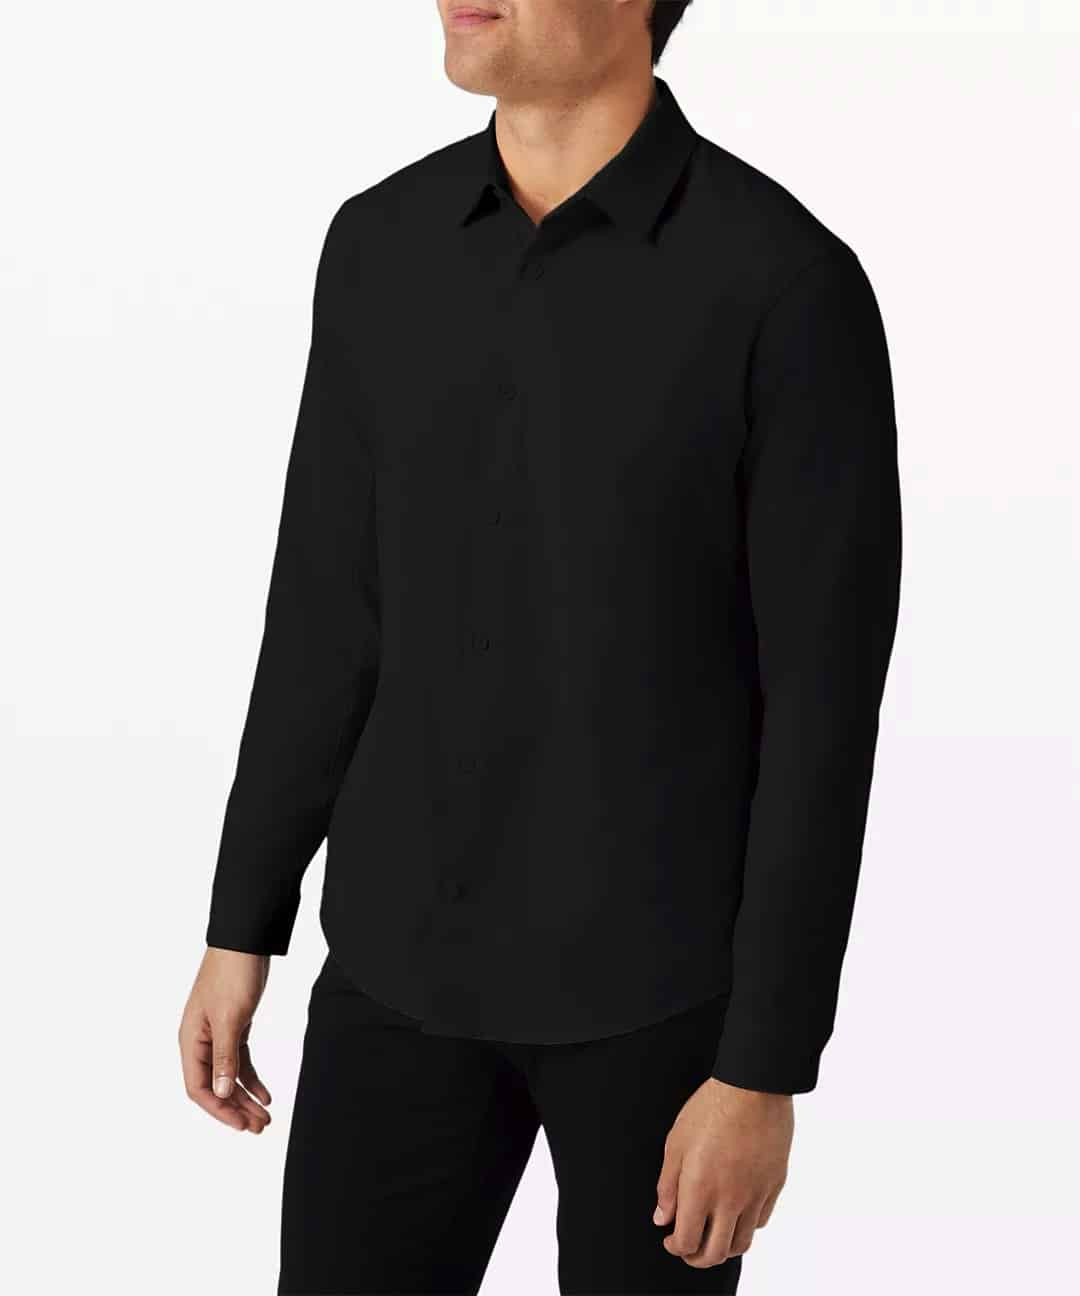 Airing Easy Long Sleeve Shirt Ventlight™ Mesh   Men's Buttondown Shirts   lululemon